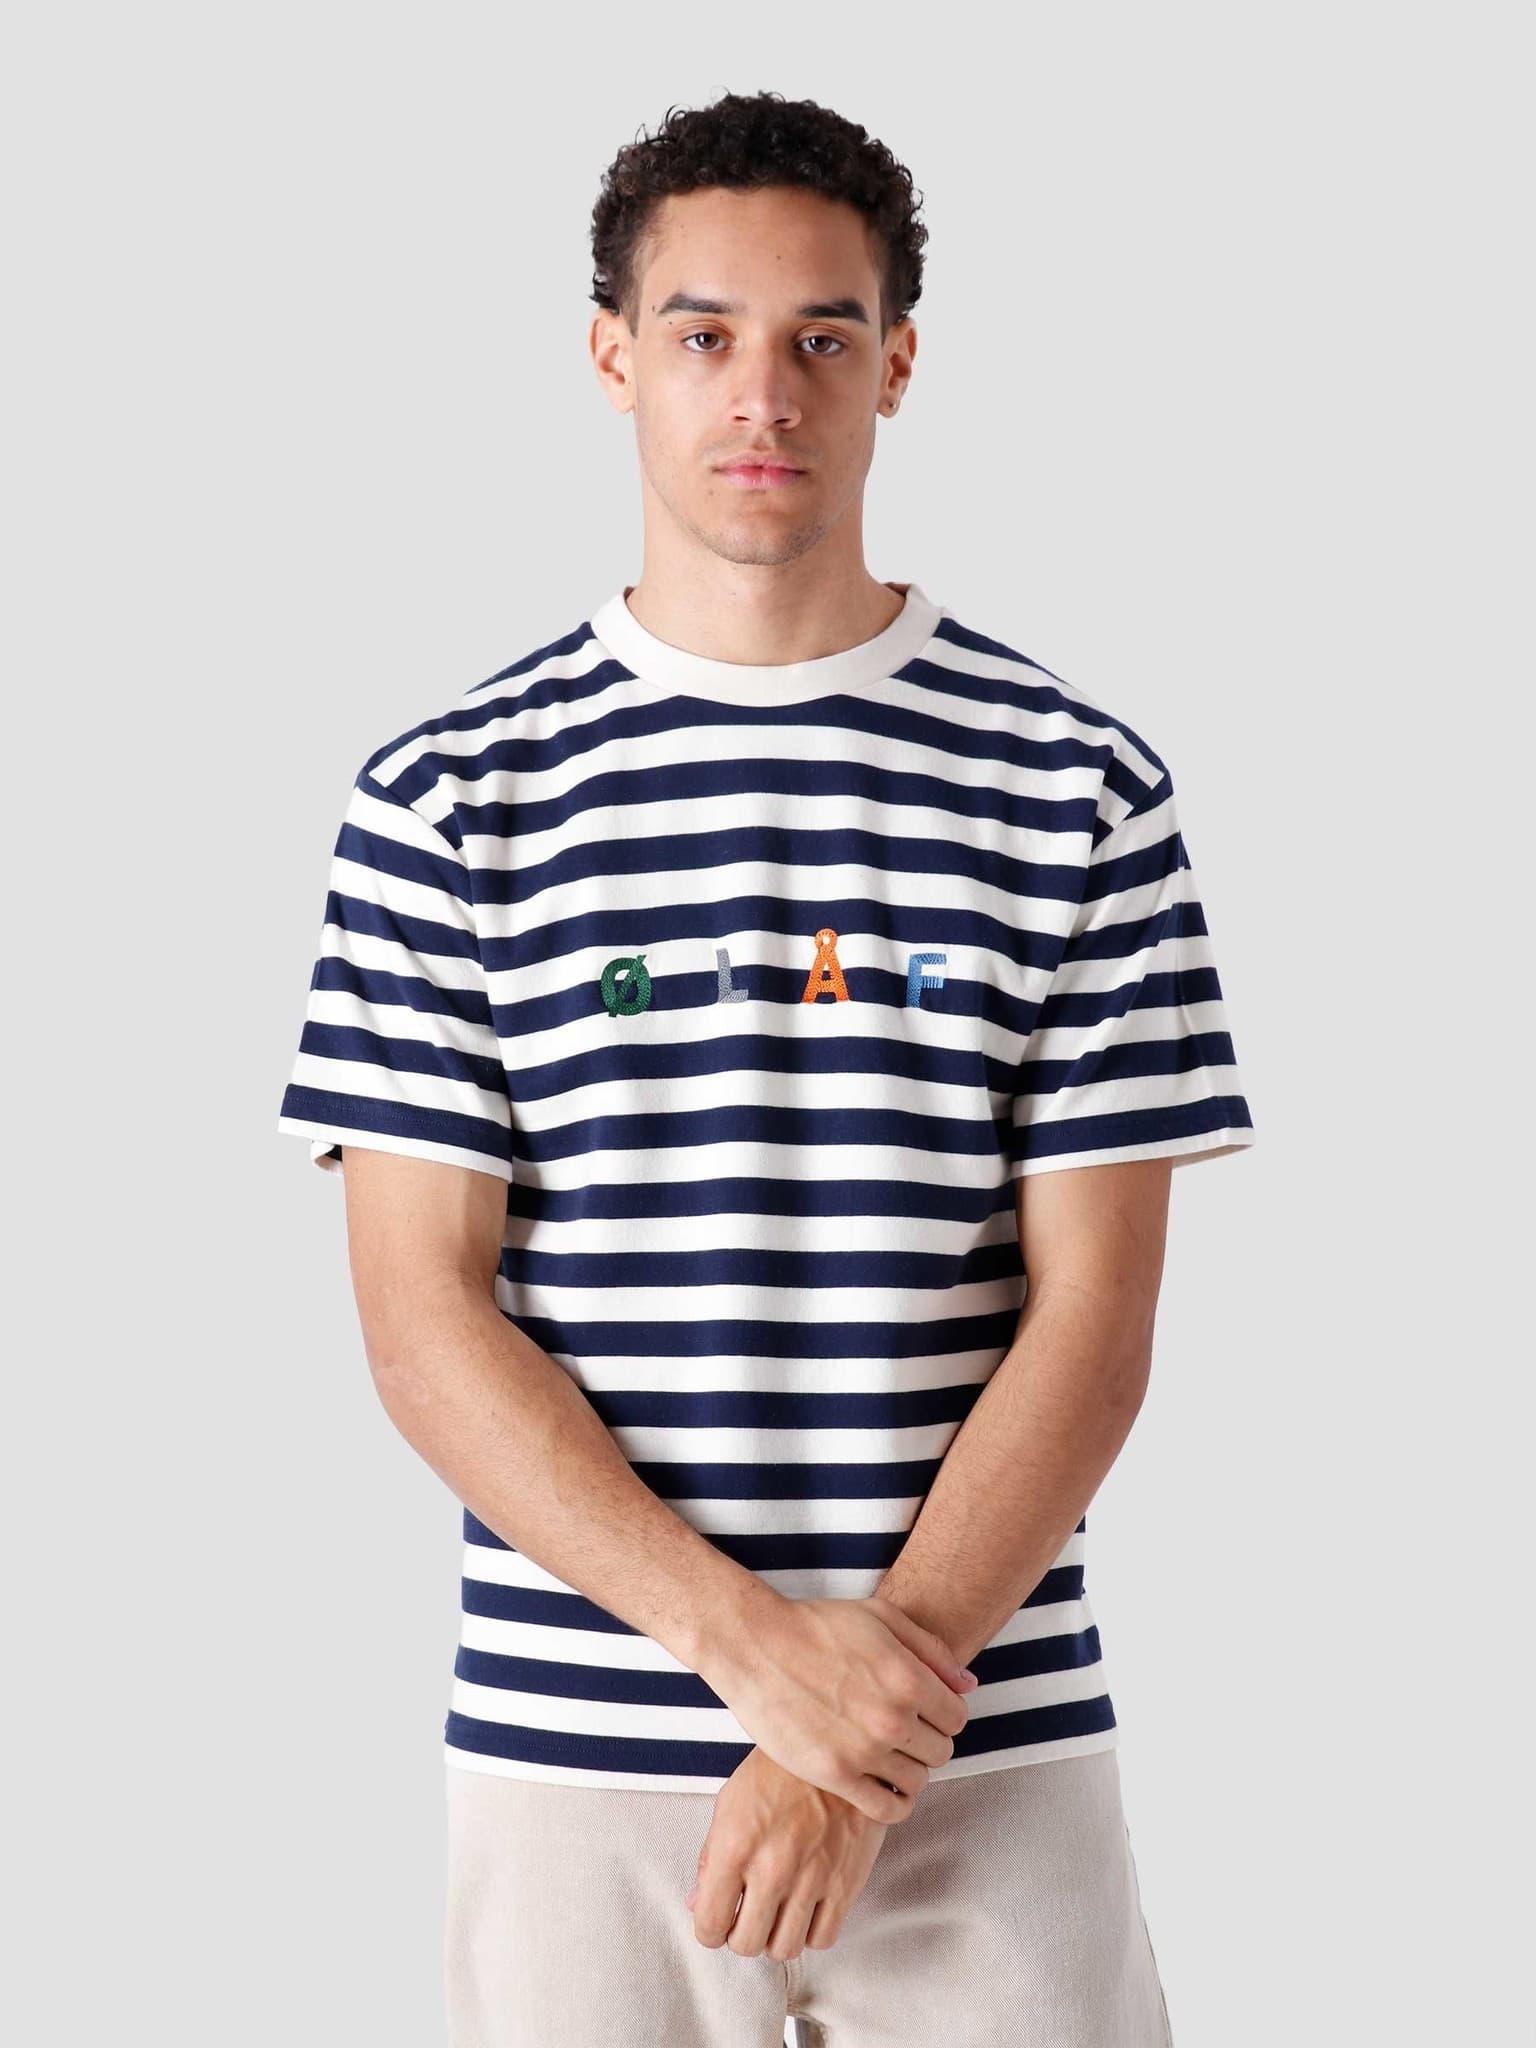 Stripe Sans T-Shirt White Blue